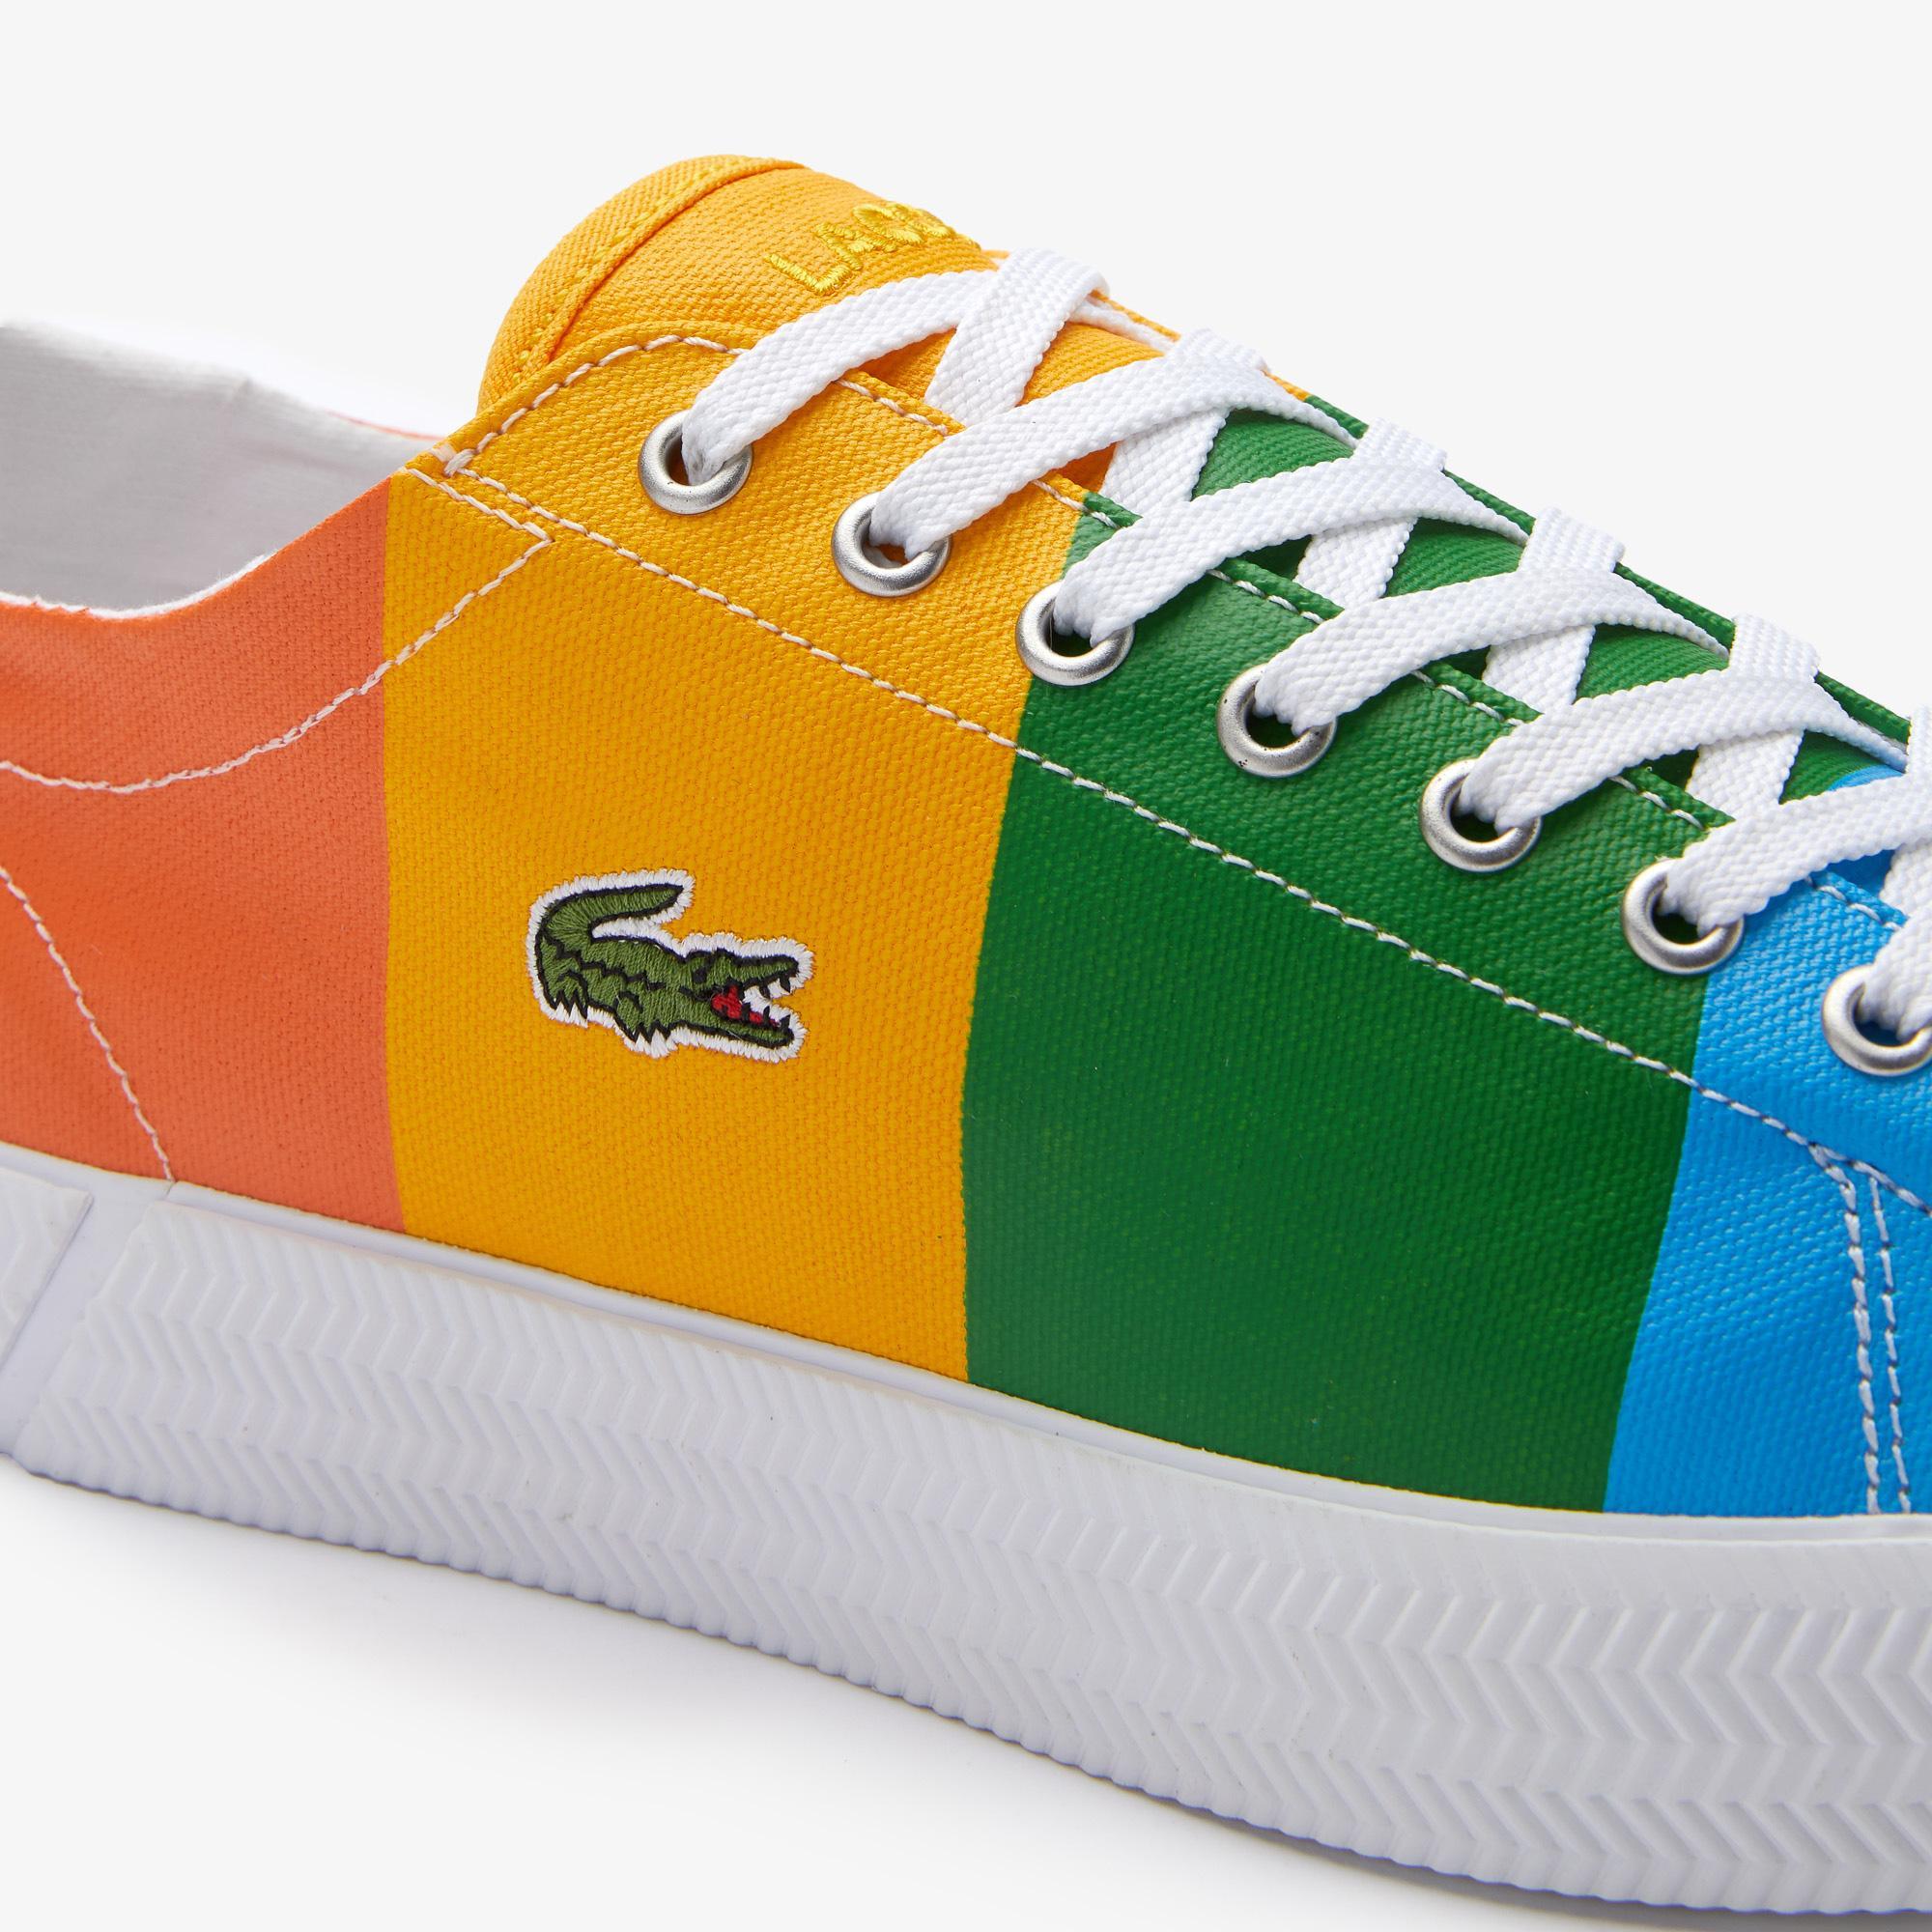 Lacoste Gripshot Paloroid Erkek Renkli Sneaker